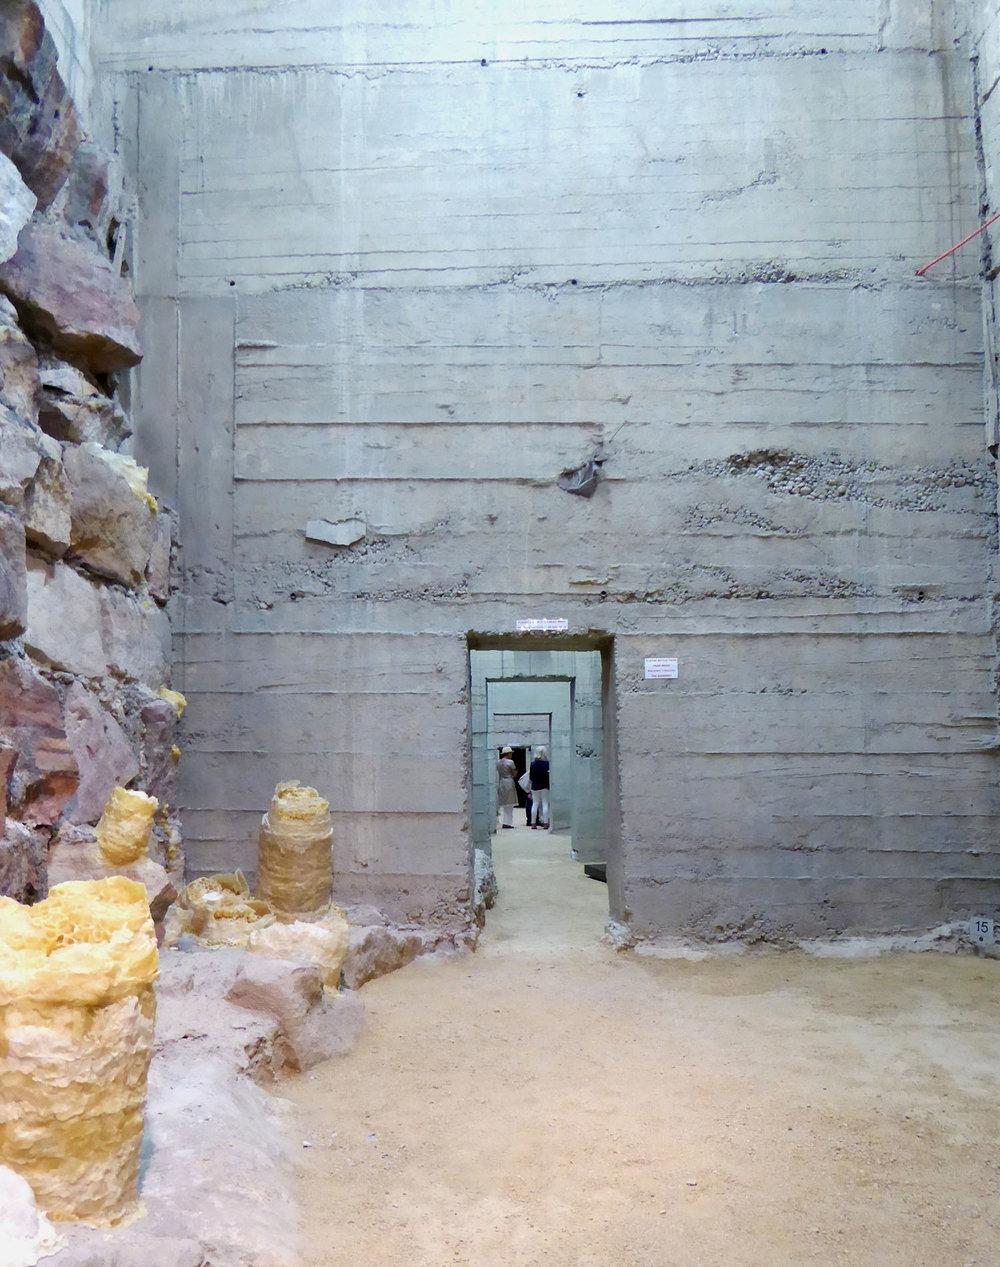 Exhibition space below platform